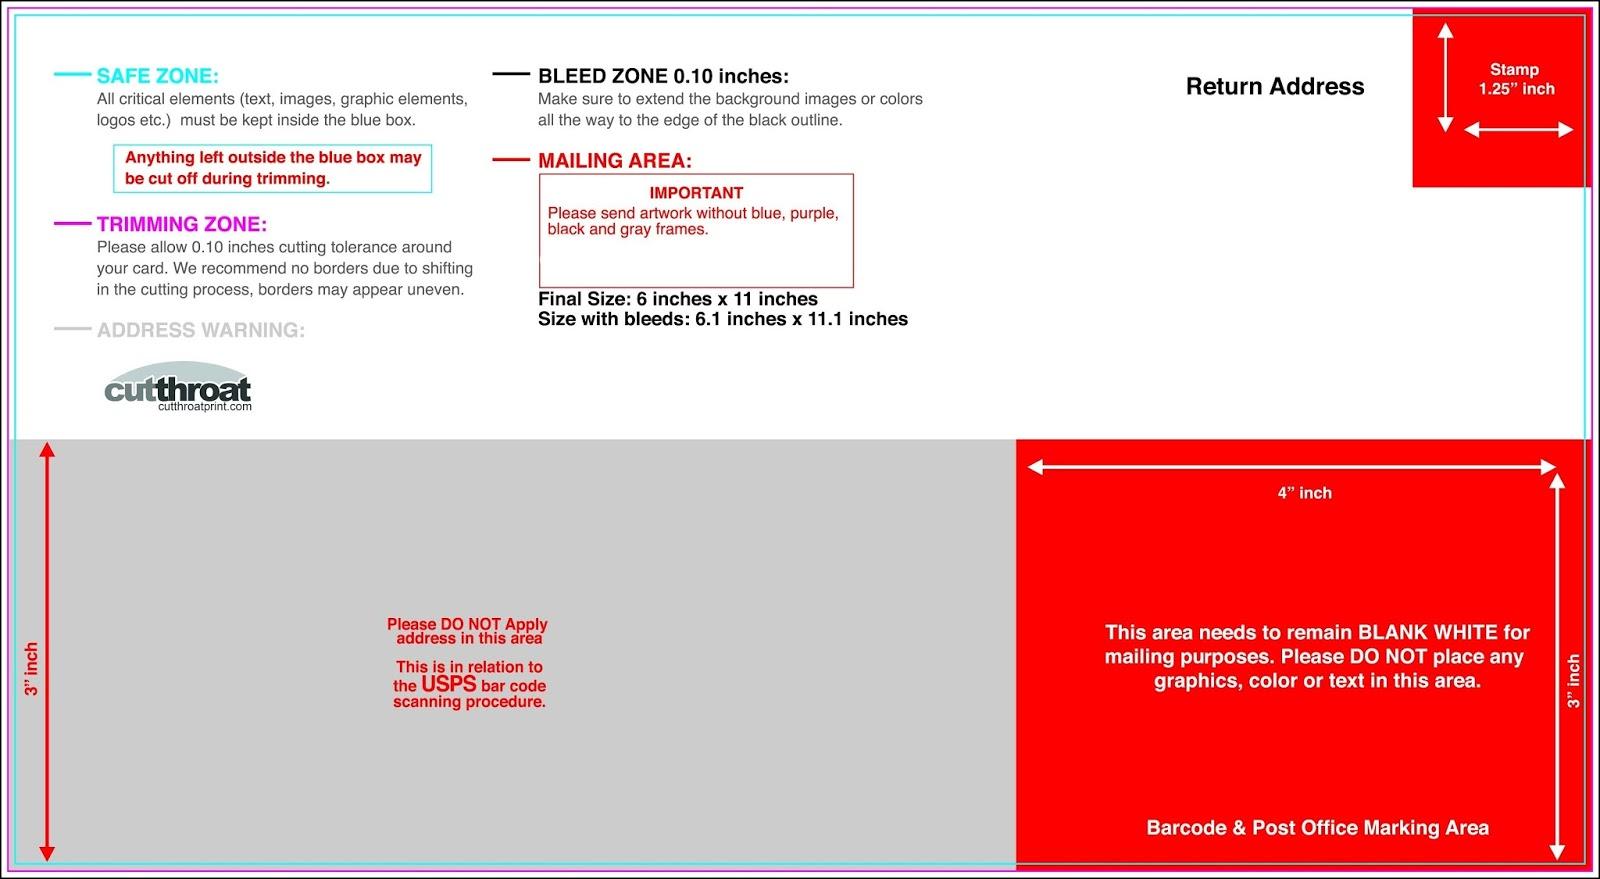 6x11 postcard template, 6x9 postcard, usps postcard specifications, usps postcard size, 6x9 postcard template, usps postcard template 5x7, postage cost for 6x9 postcard, 6.5 x 9 postcard printing, 9x6 postcard, 6 x 9 letter postage, postage calculator for 6x9 envelope, 6x9 envelope postage cost, 6x9 letter postage rate, 6x9 postcard template, return address on postcard regulations